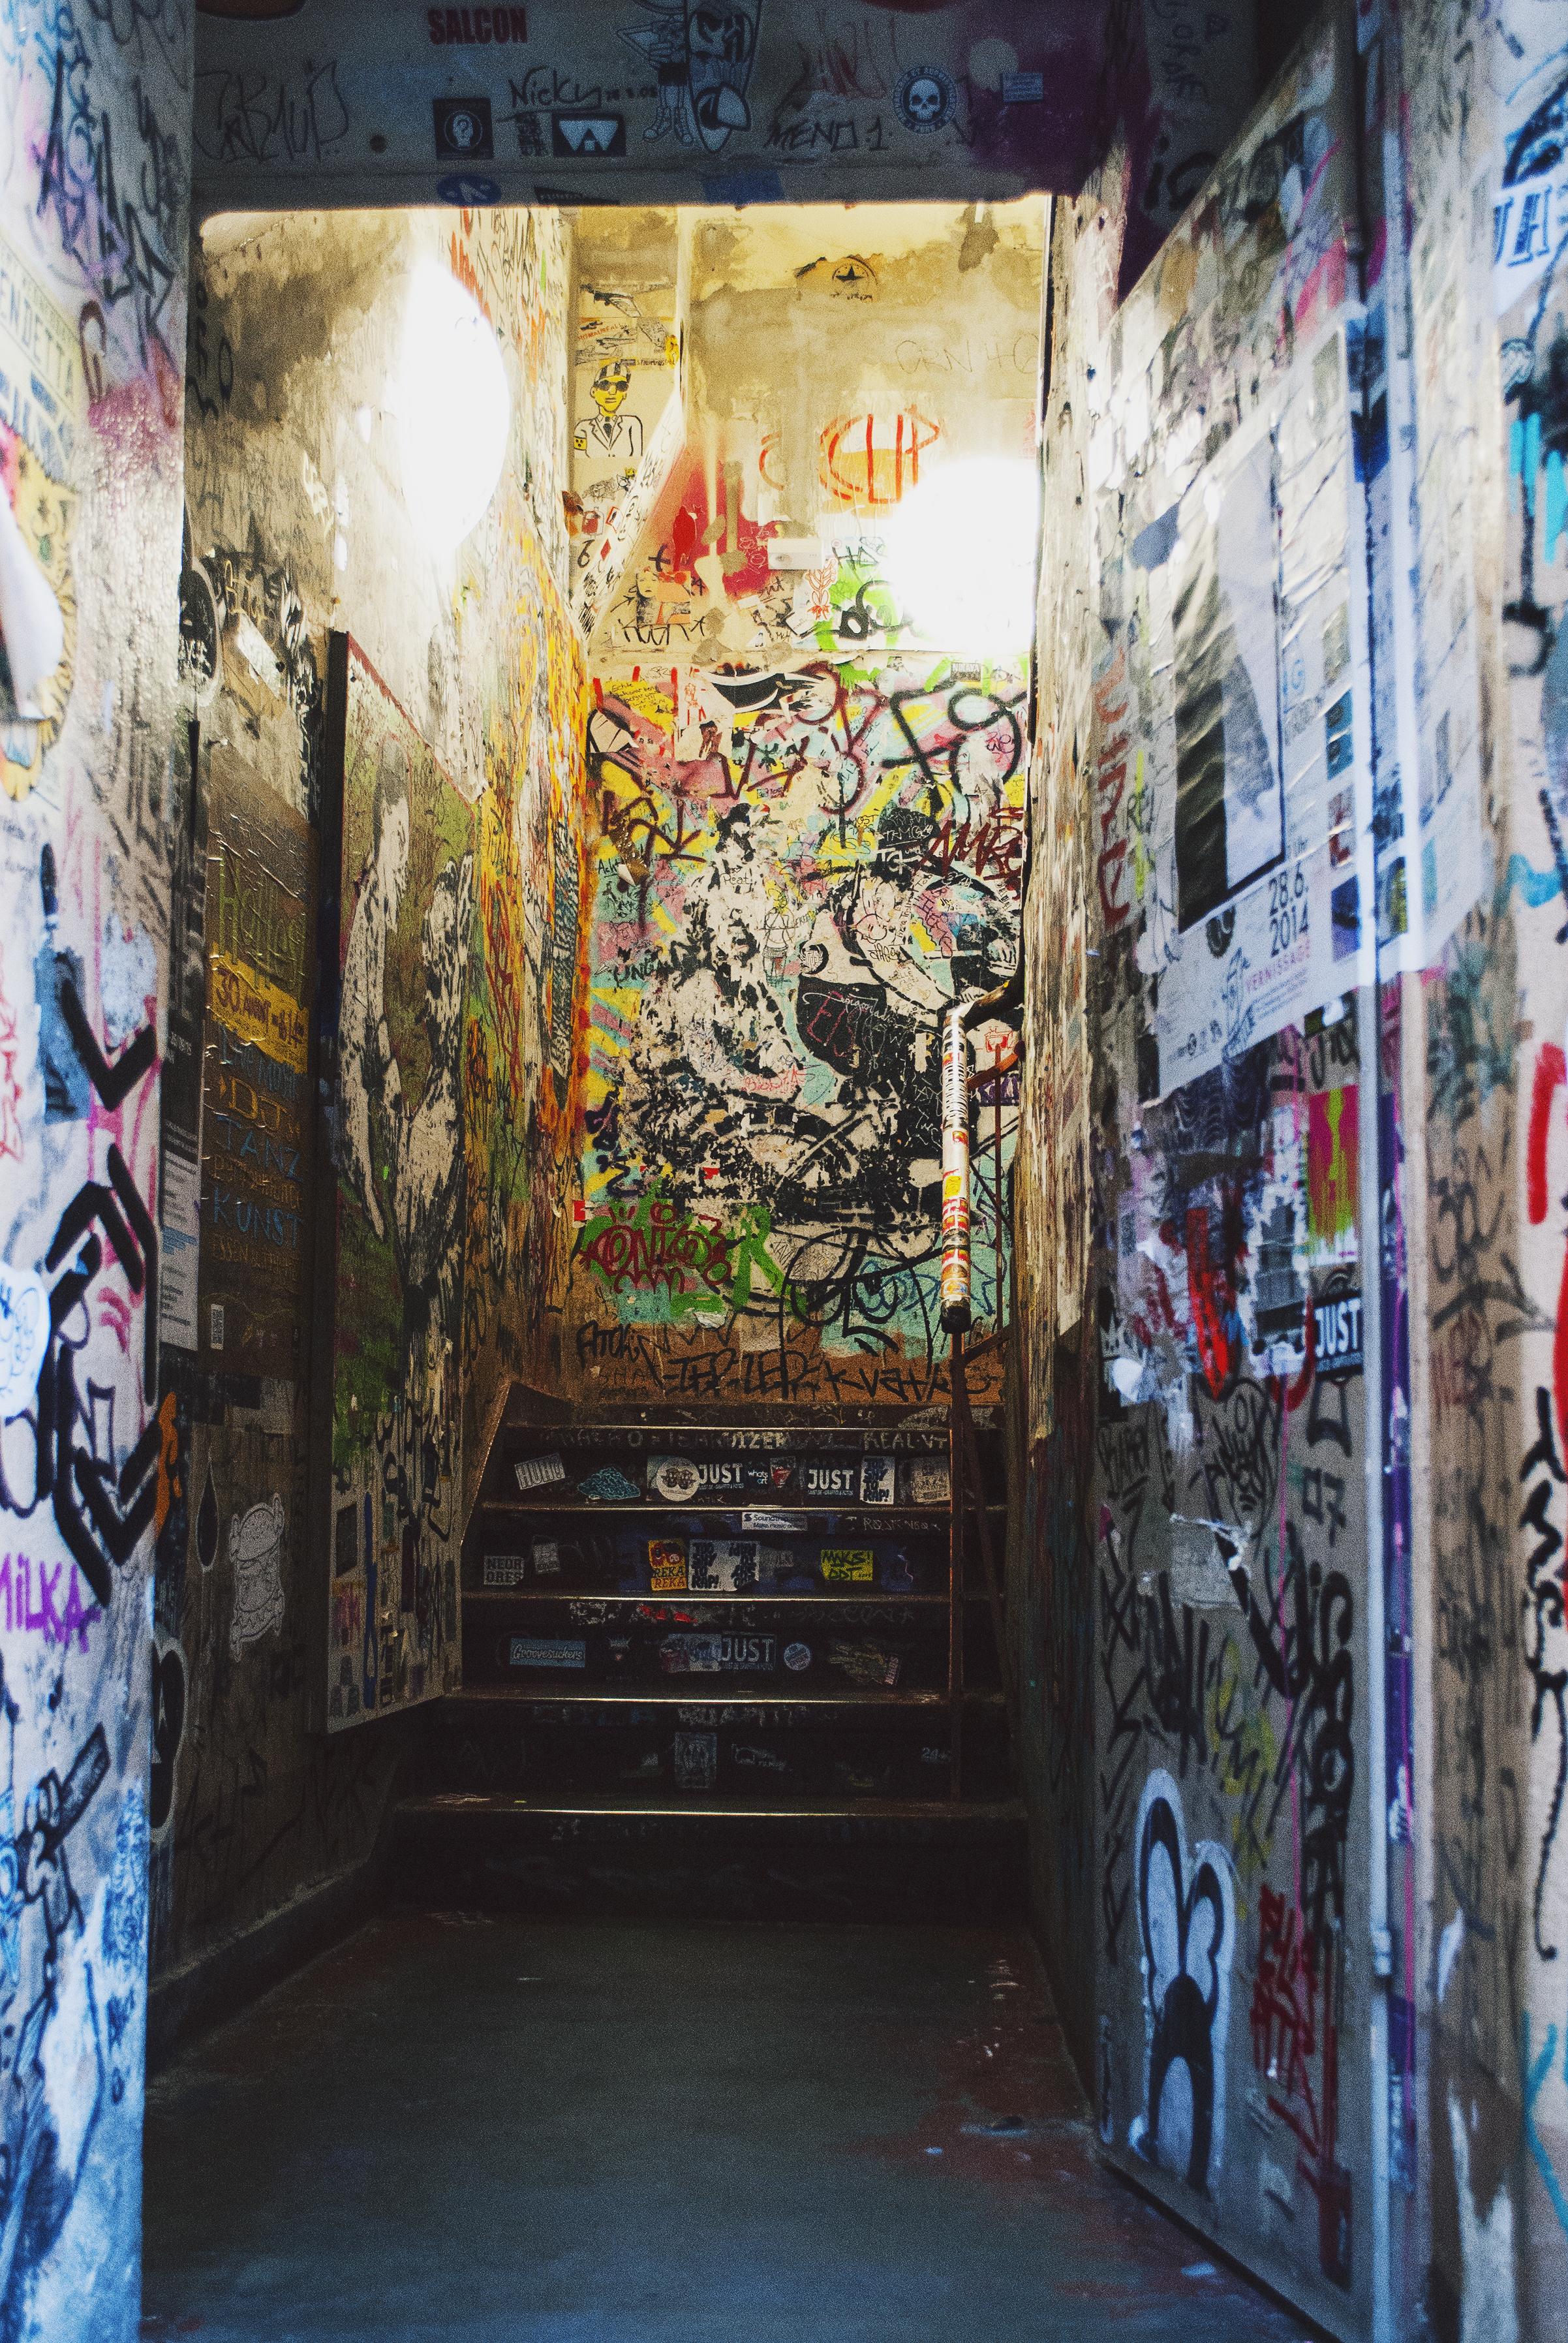 Berlin Travel Diary Cafe Cinema Street Art Graffiti